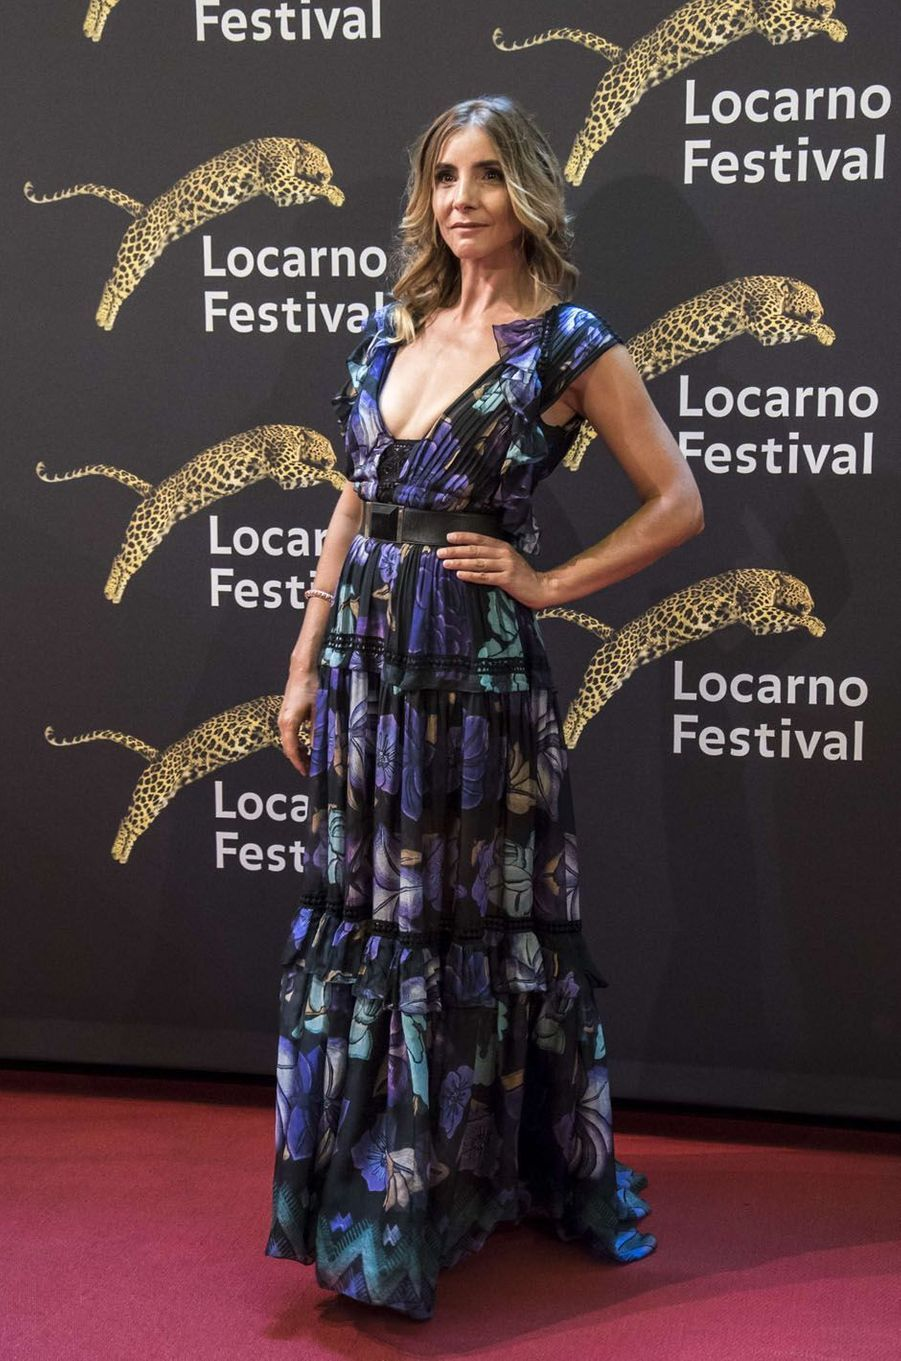 Clotilde Courauau festival de Loncarno, le 4 août 2017.